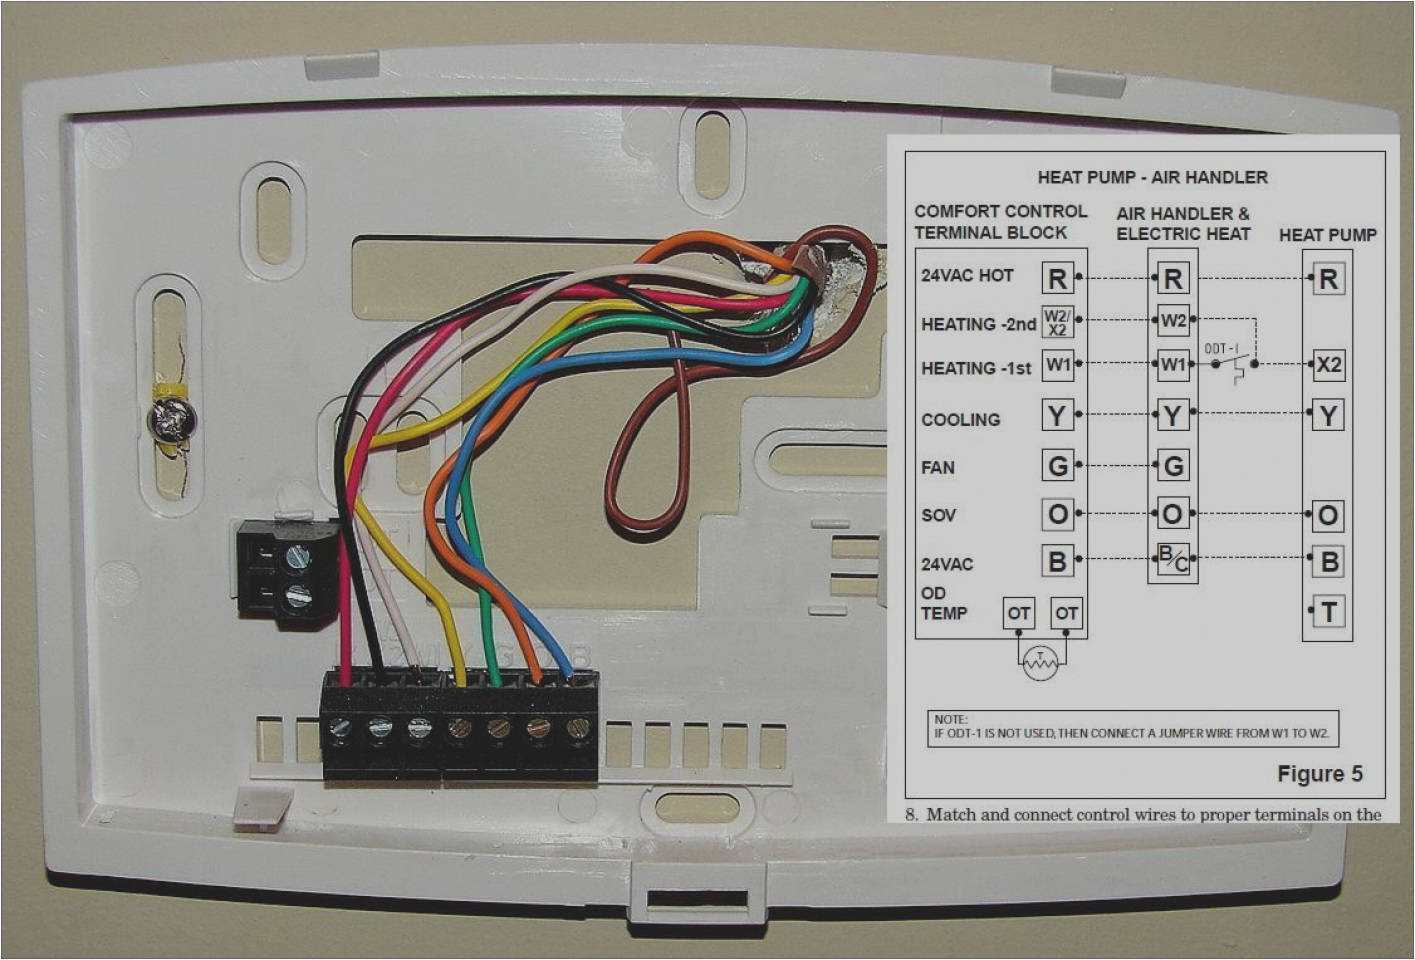 hunter 44360 wiring diagram inspirational honeywell 6 wire thermostat wiring diagram download wiring diagrams